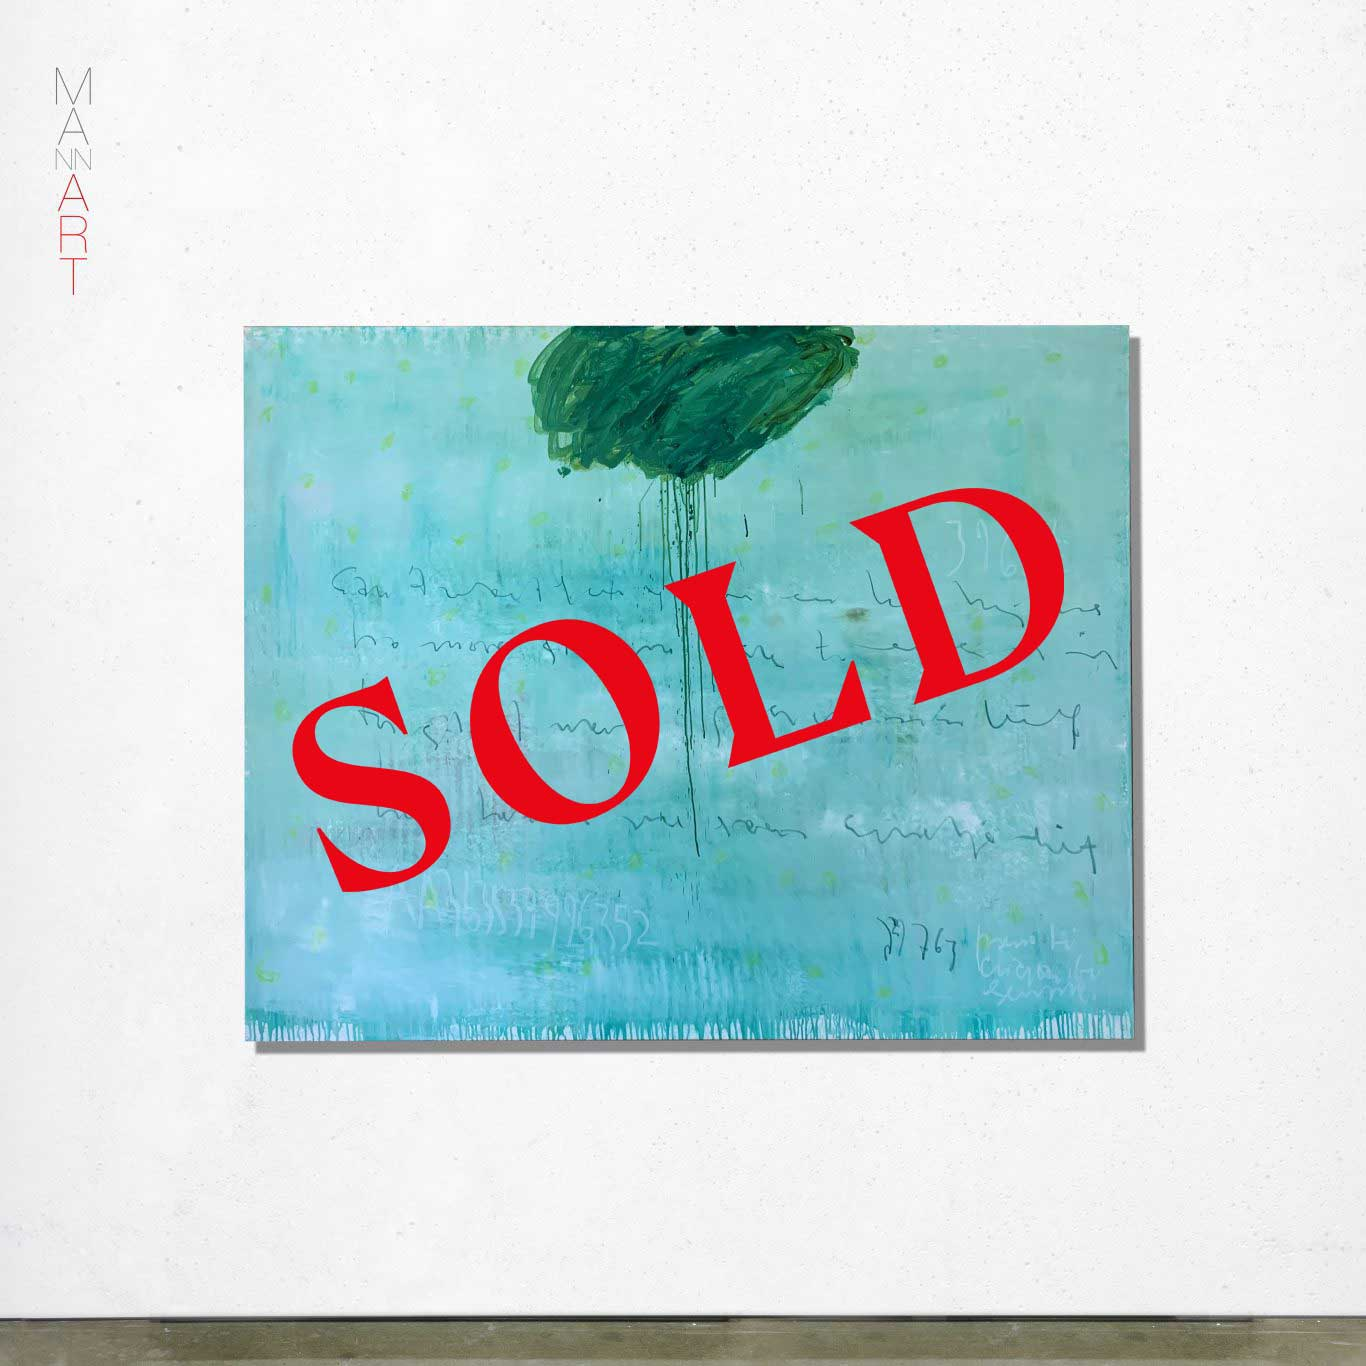 MANNA Art Rain On Me Green - Sold